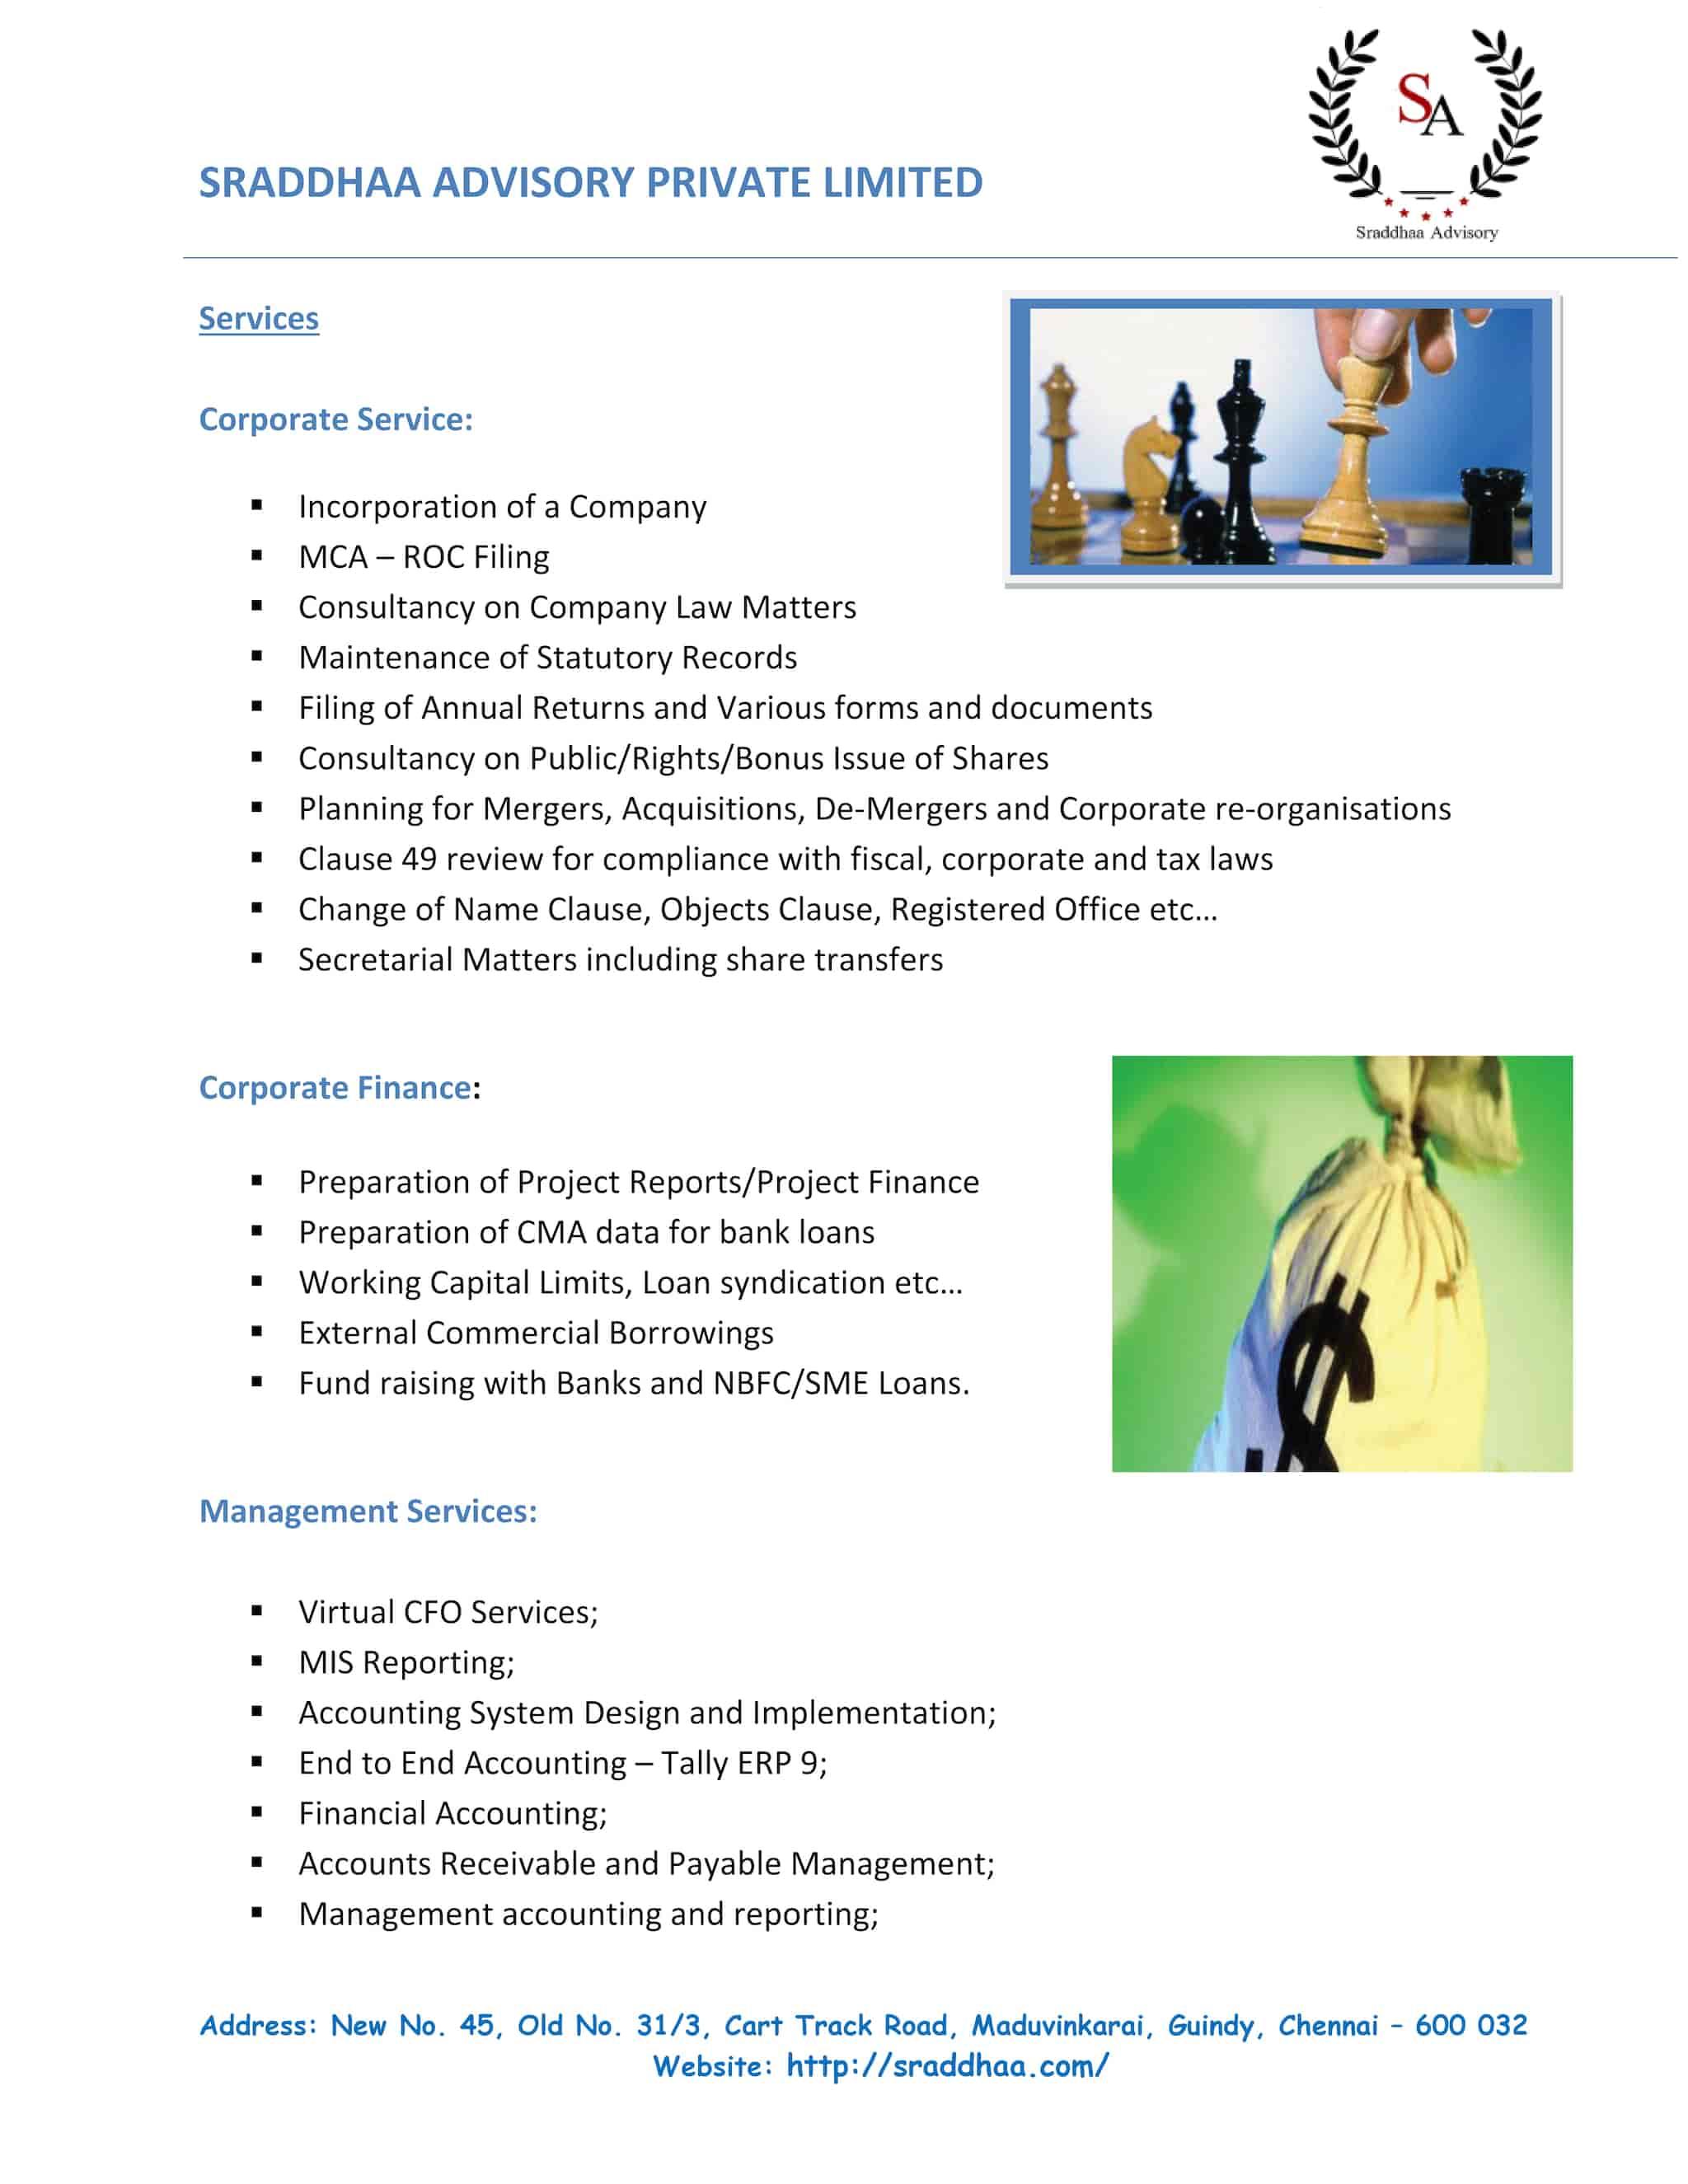 Sraddhaa Advisory Pvt Ltd, Guindy - Auditors in Chennai